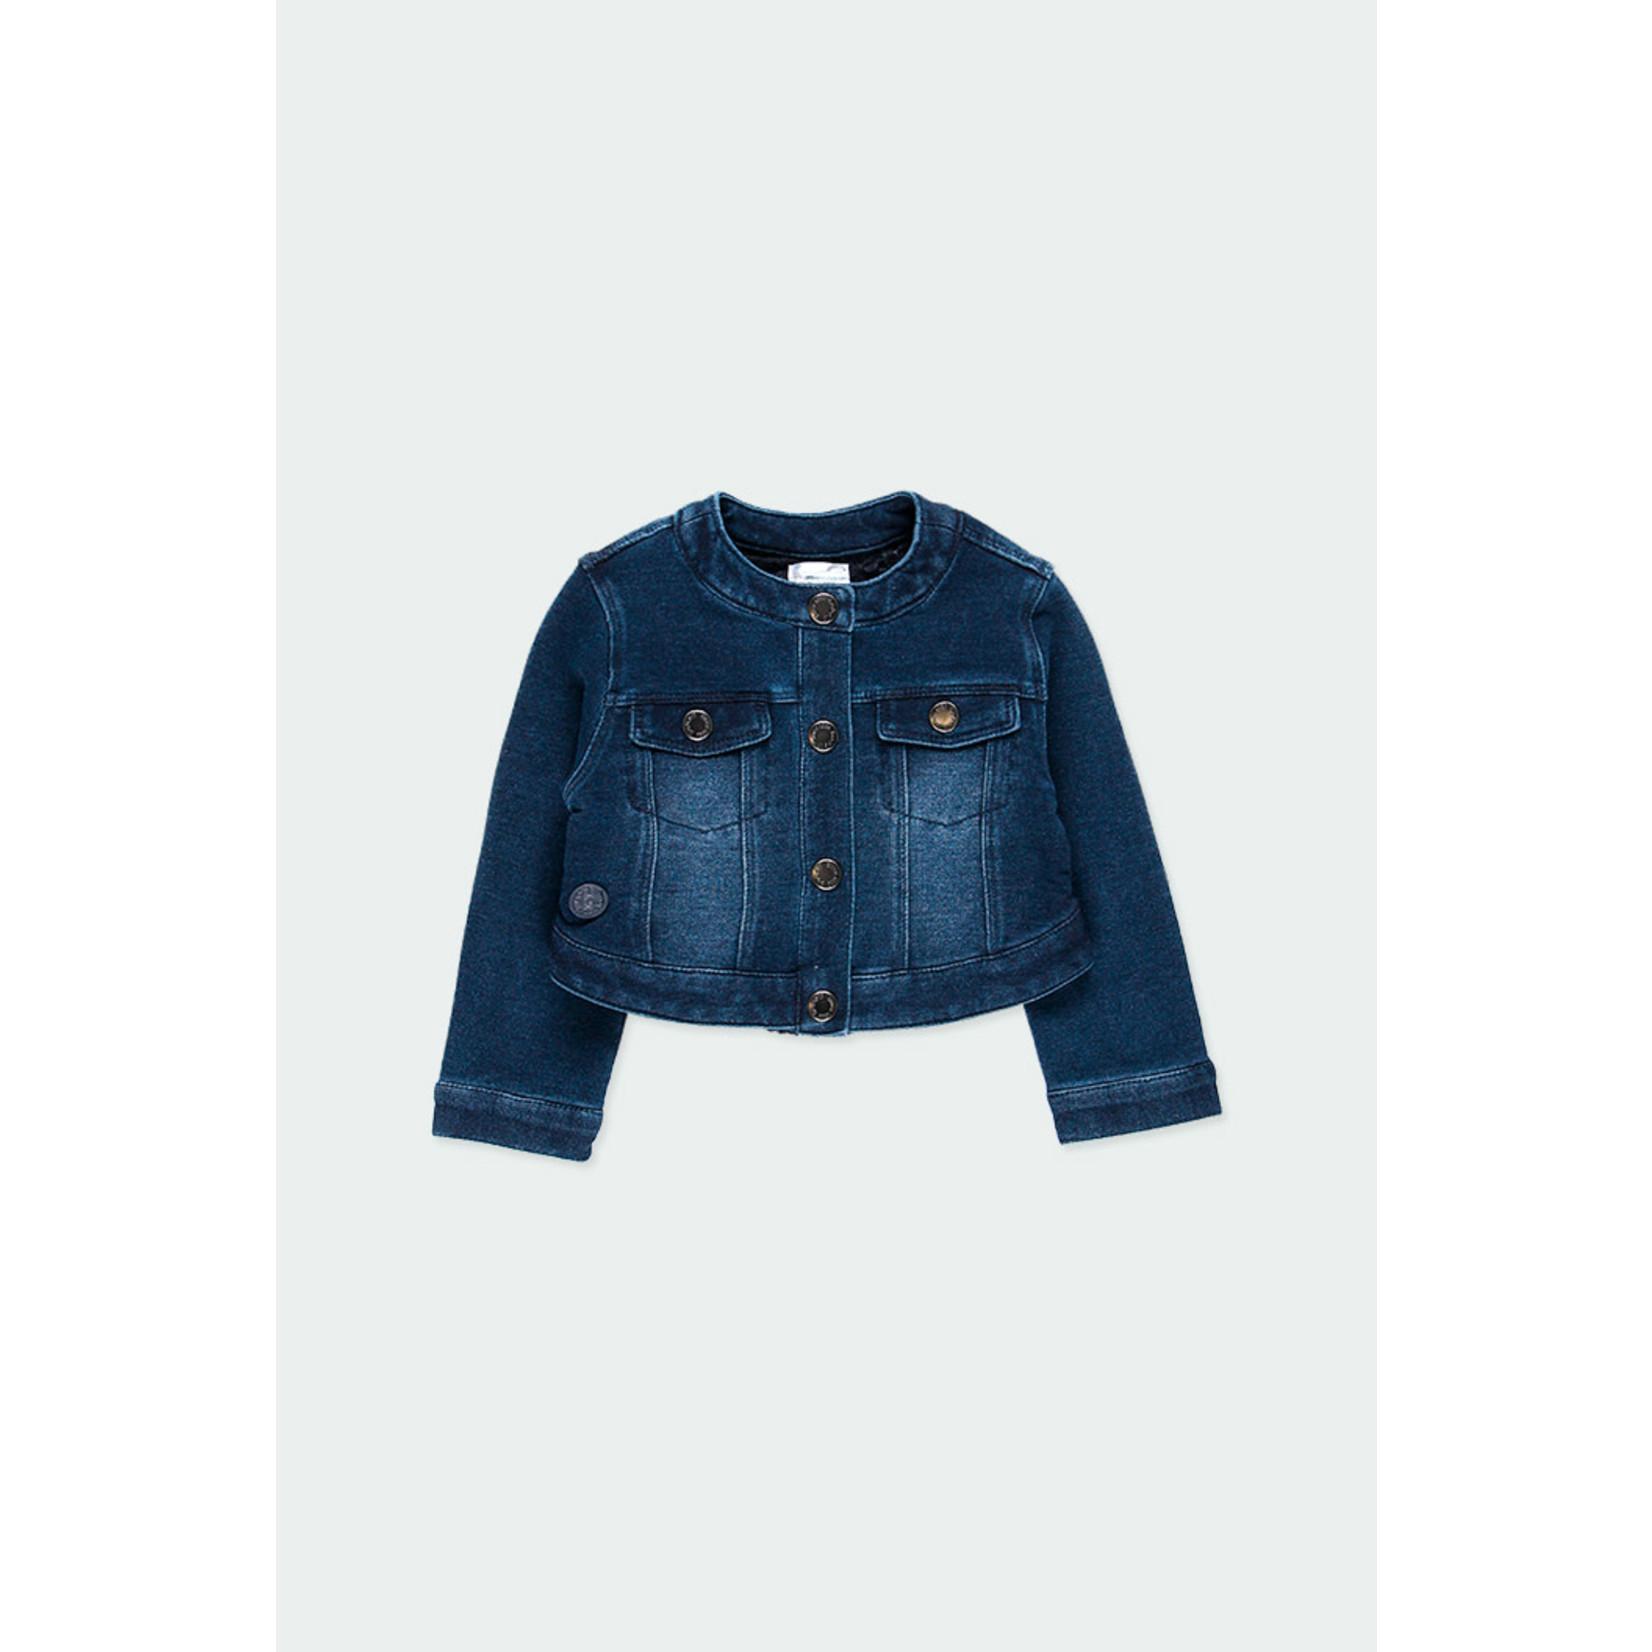 Bóboli Fleece jacket denim for  girl